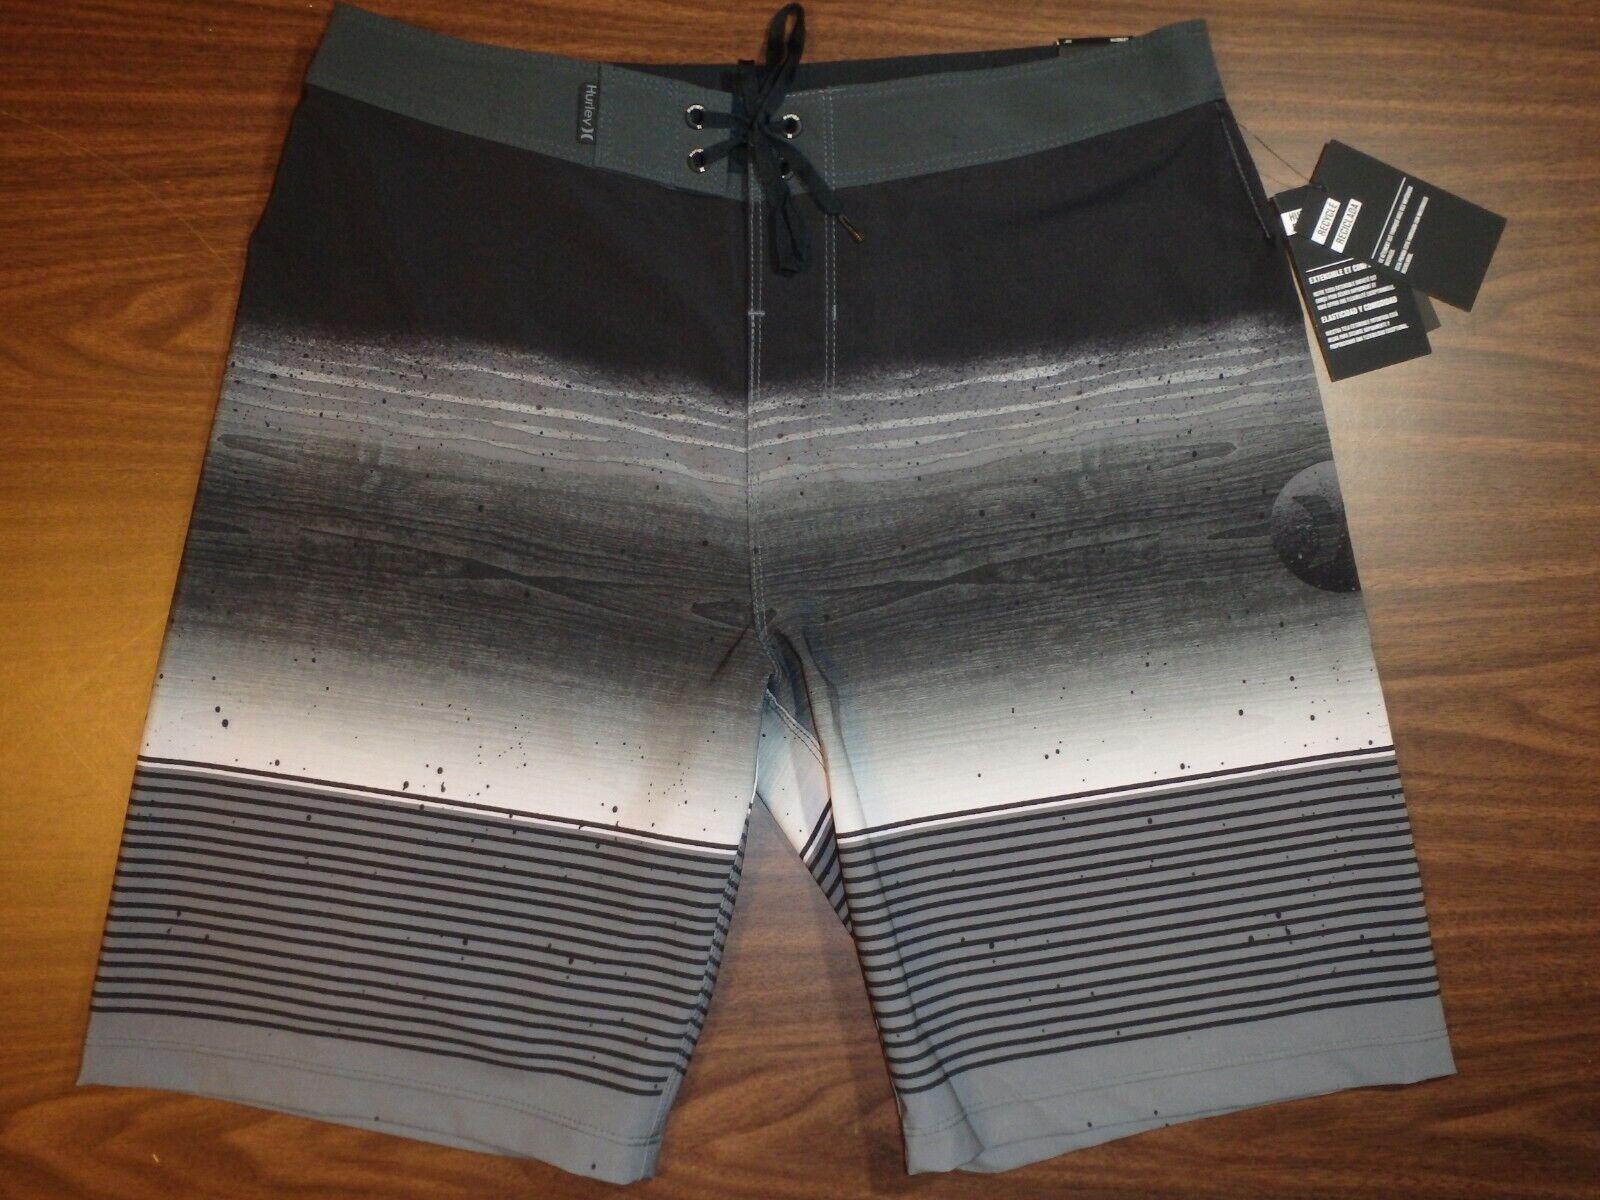 Hurley Men's Board Shorts - 20 inch Length - Black/Gray stri